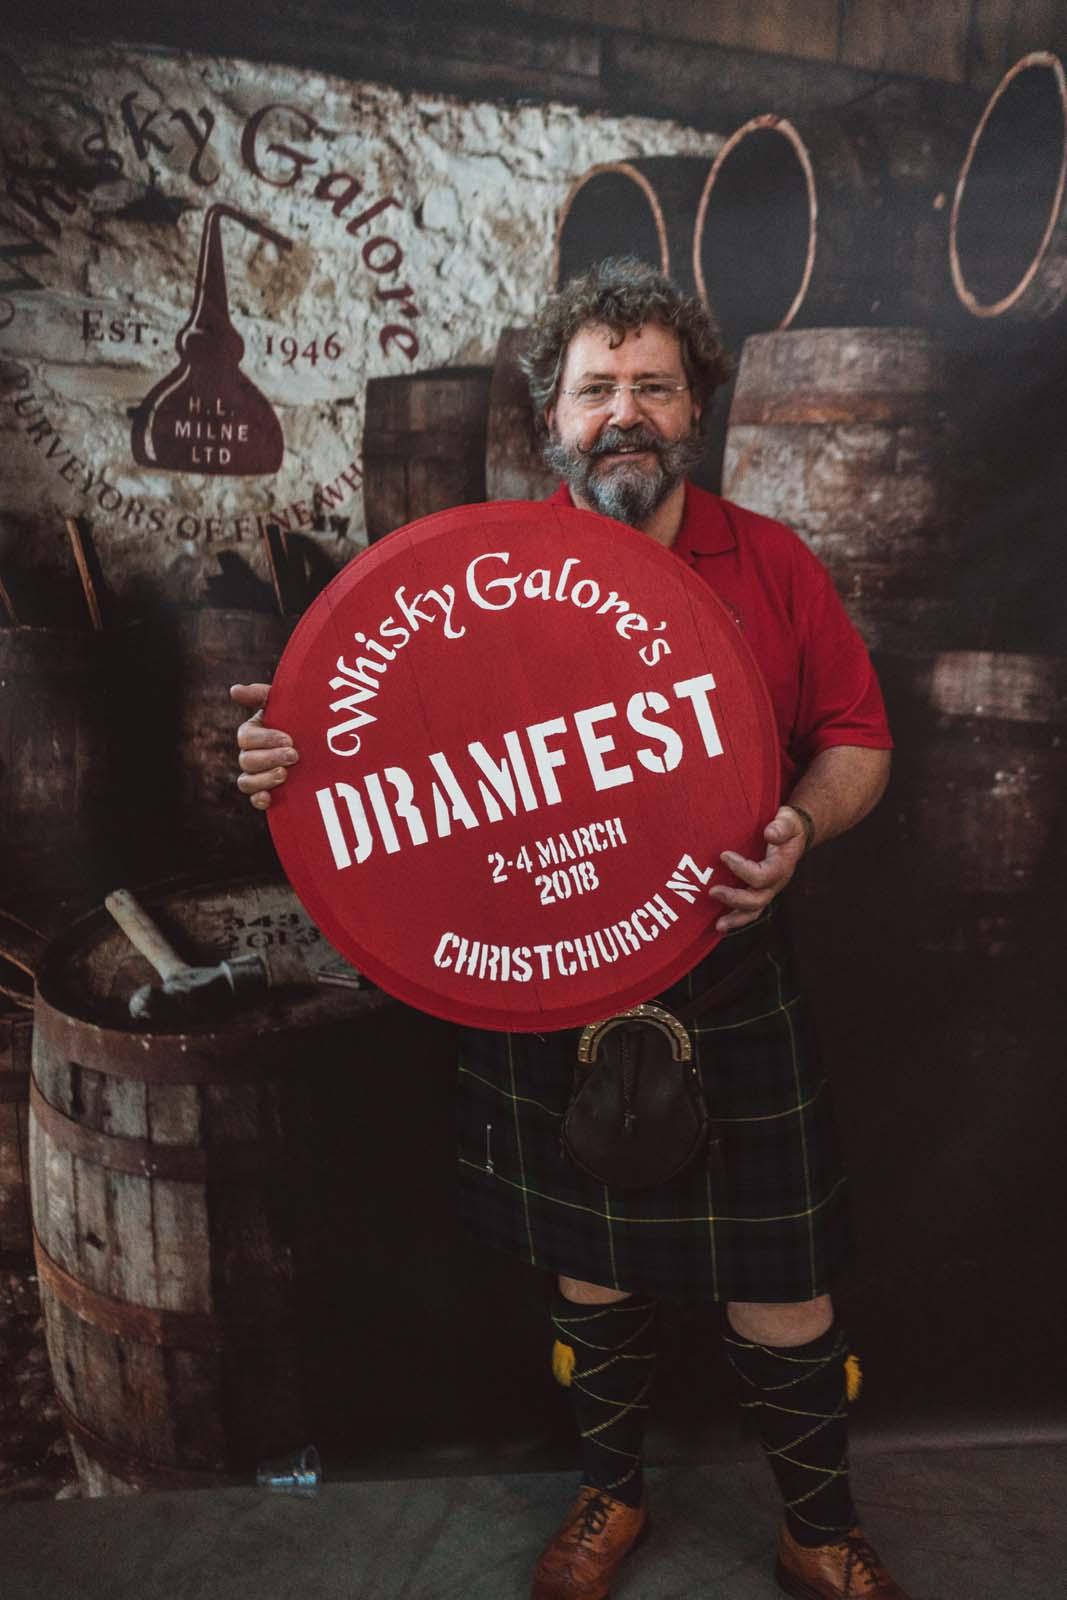 Dramfest 2018 for Whisky Galore-176.jpg